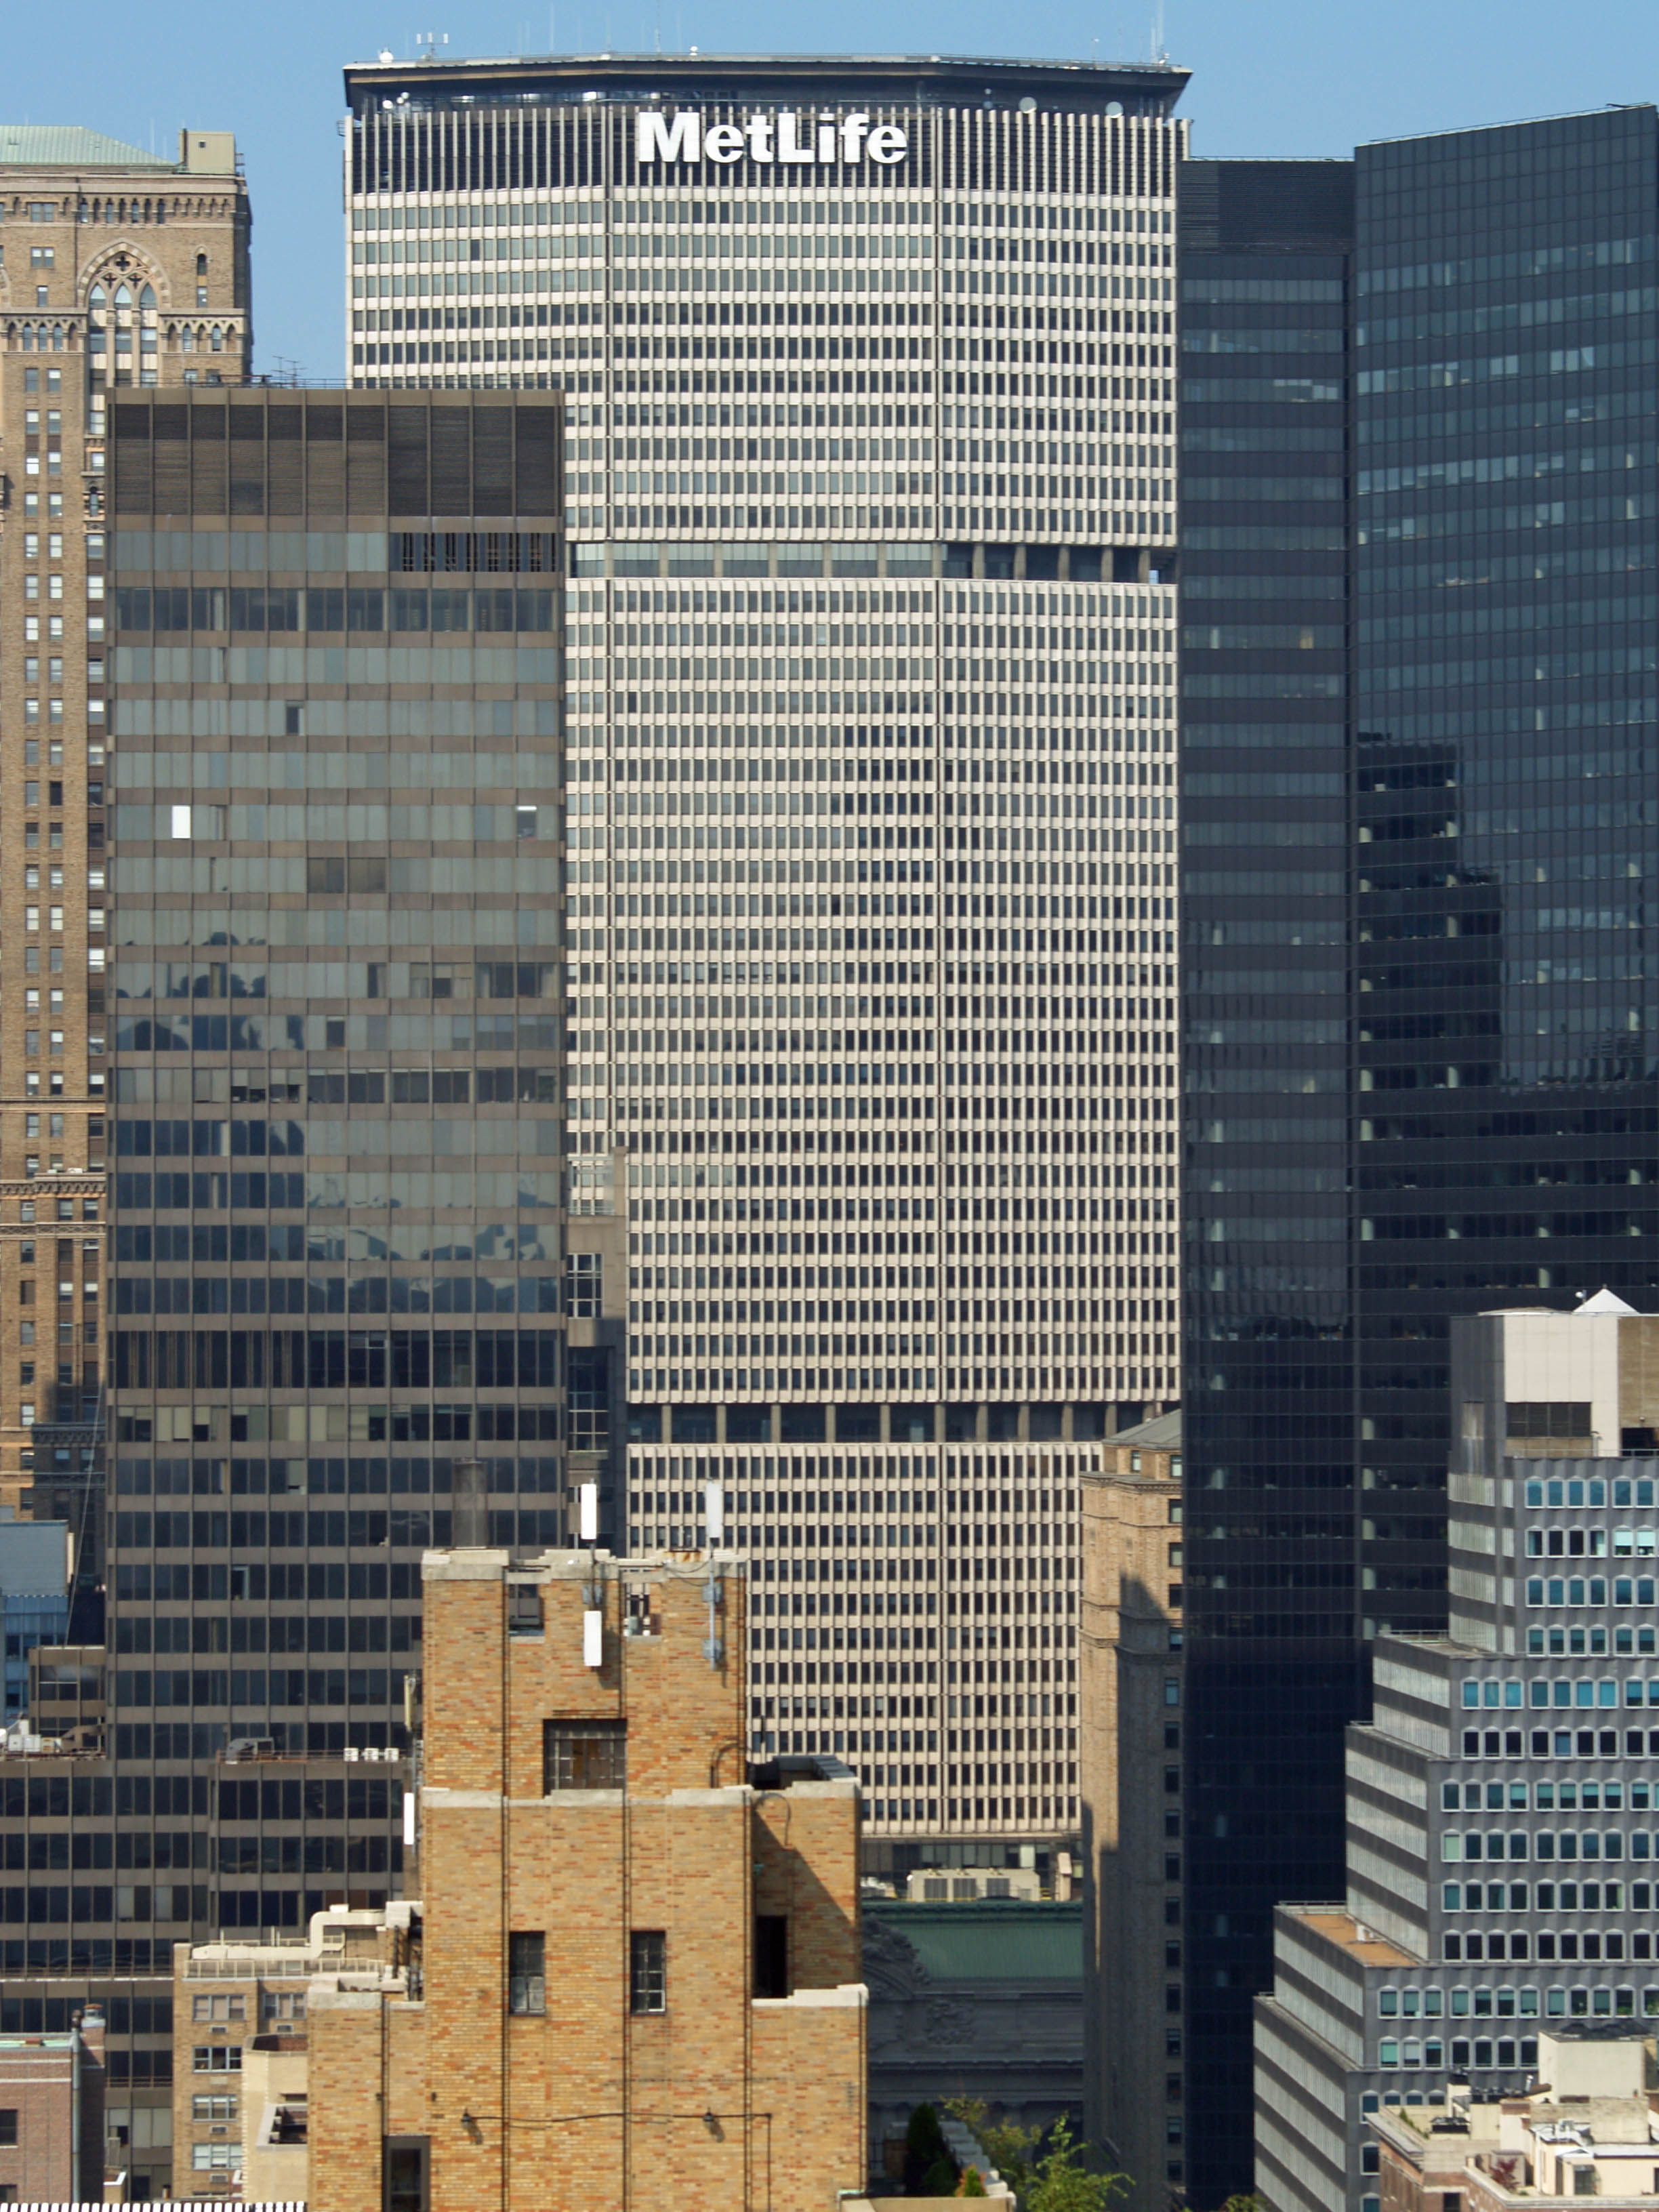 http://upload.wikimedia.org/wikipedia/commons/6/61/MetLife_Building_by_David_Shankbone.jpg